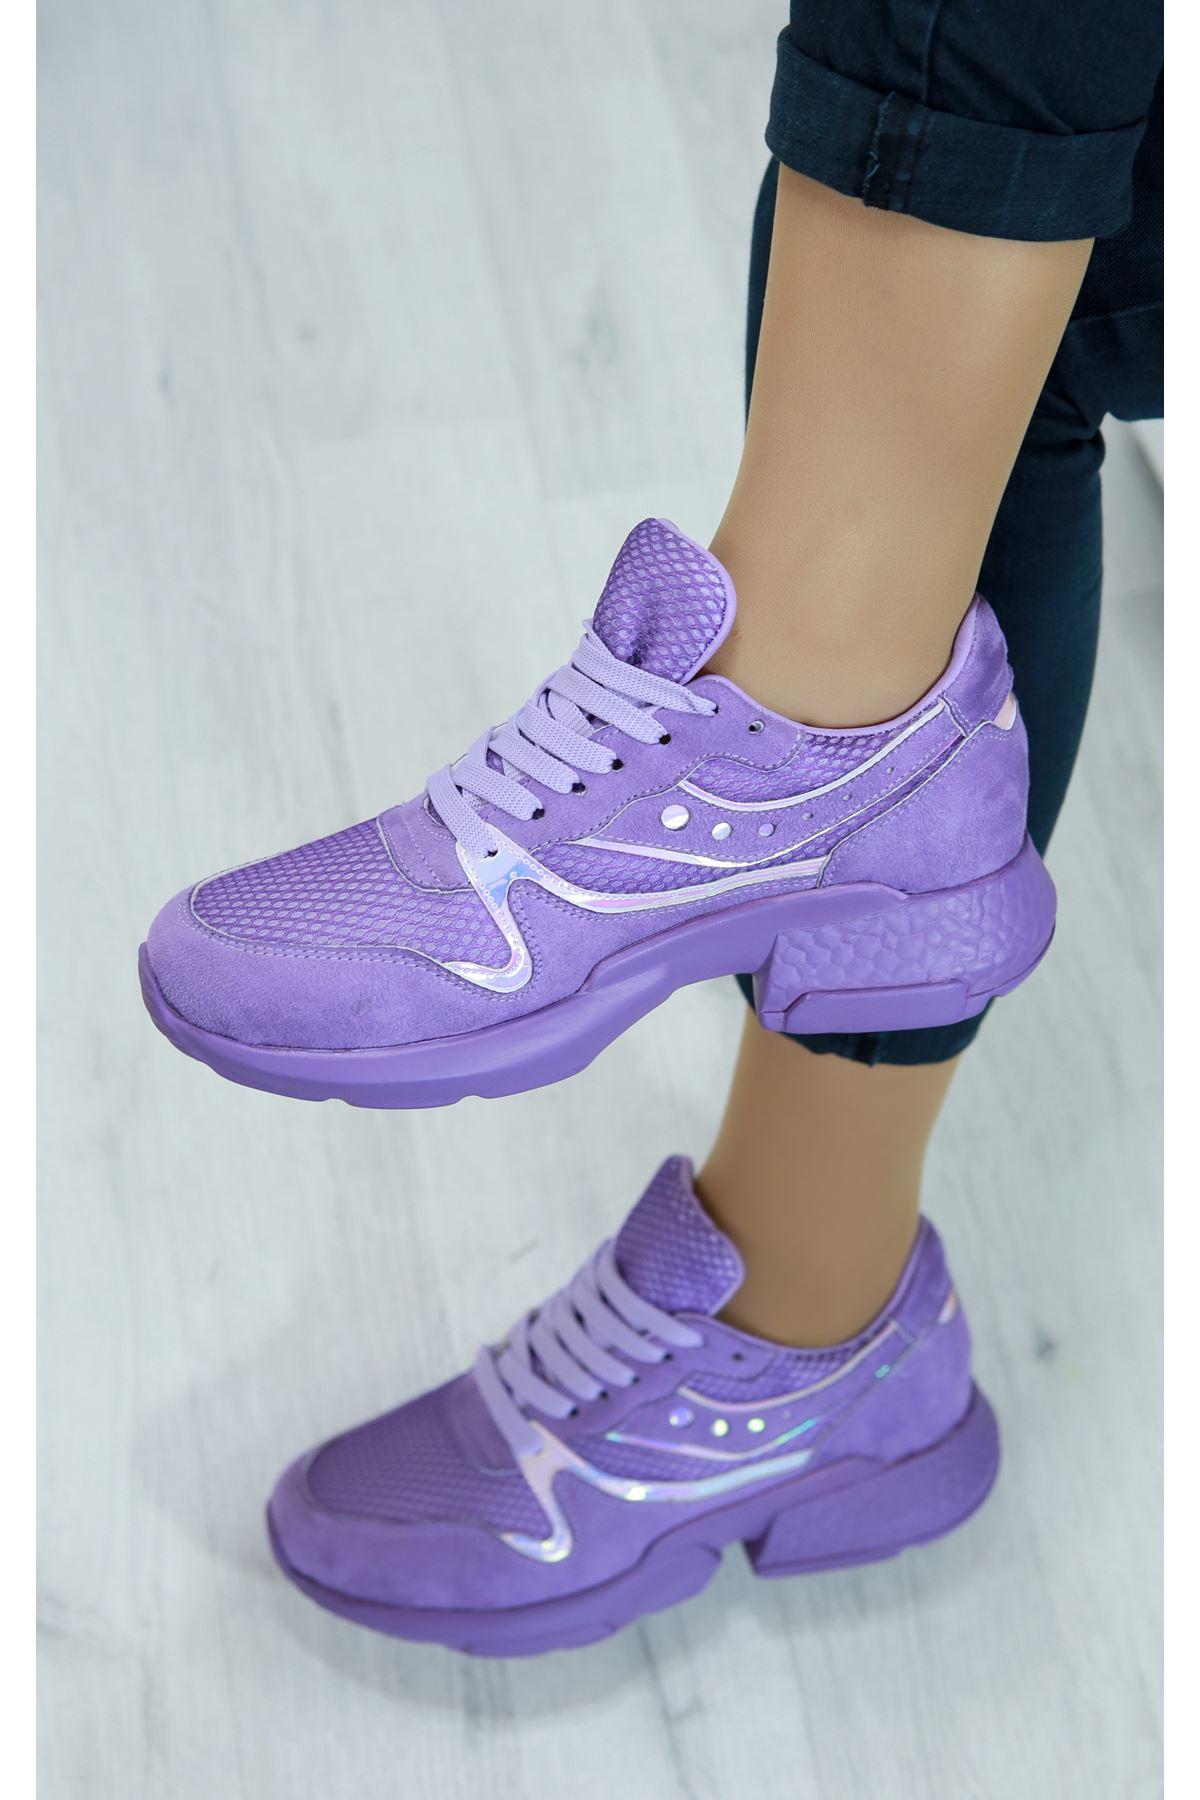 Marzo Mor Lame İthal Süet Bayan Spor Ayakkabı